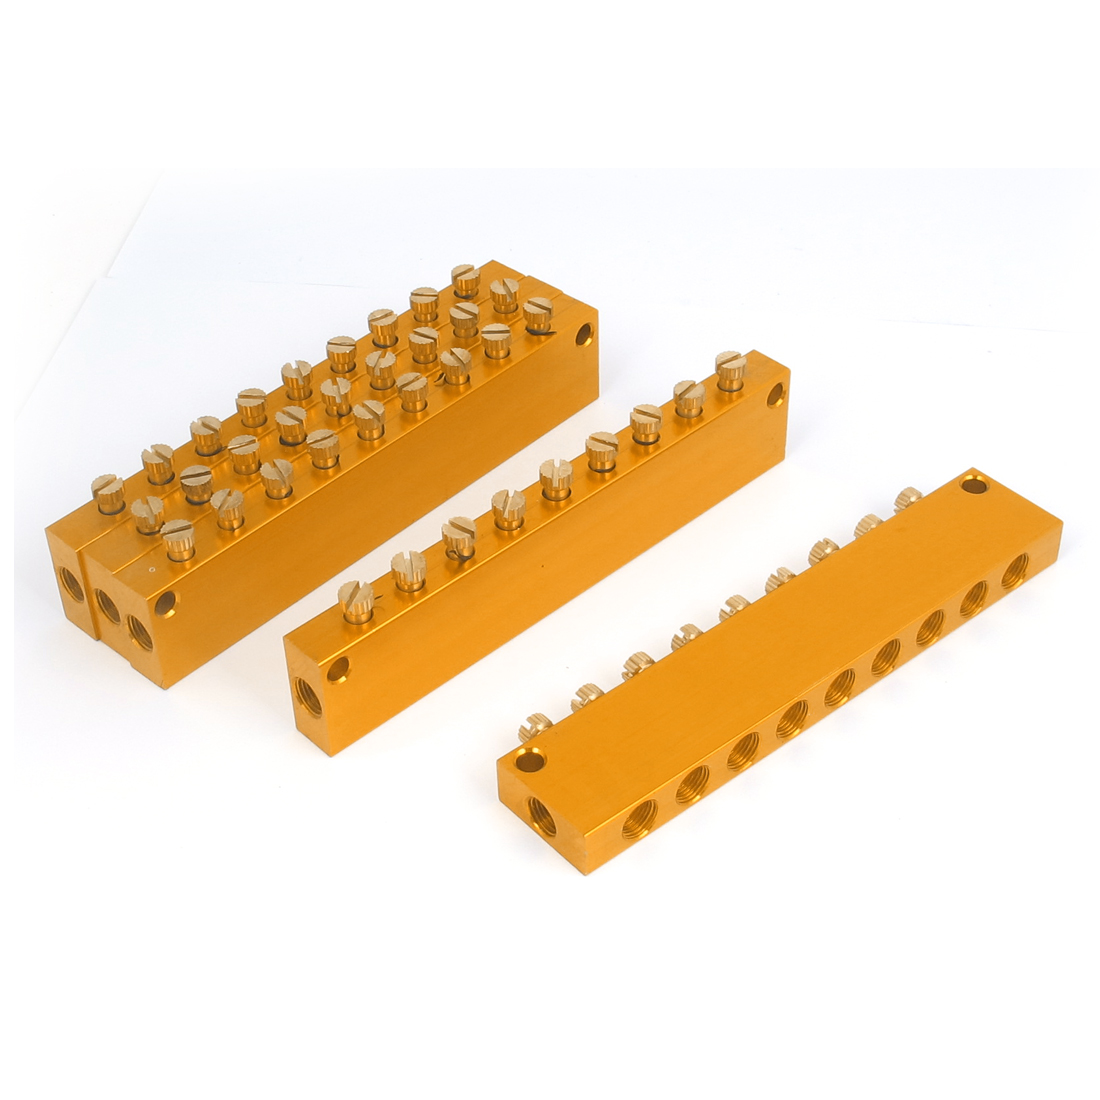 Aluminum Air Pneumatic Adjustable 9 Ways Oil Distributor Manifold Block 150mm Long 5pcs